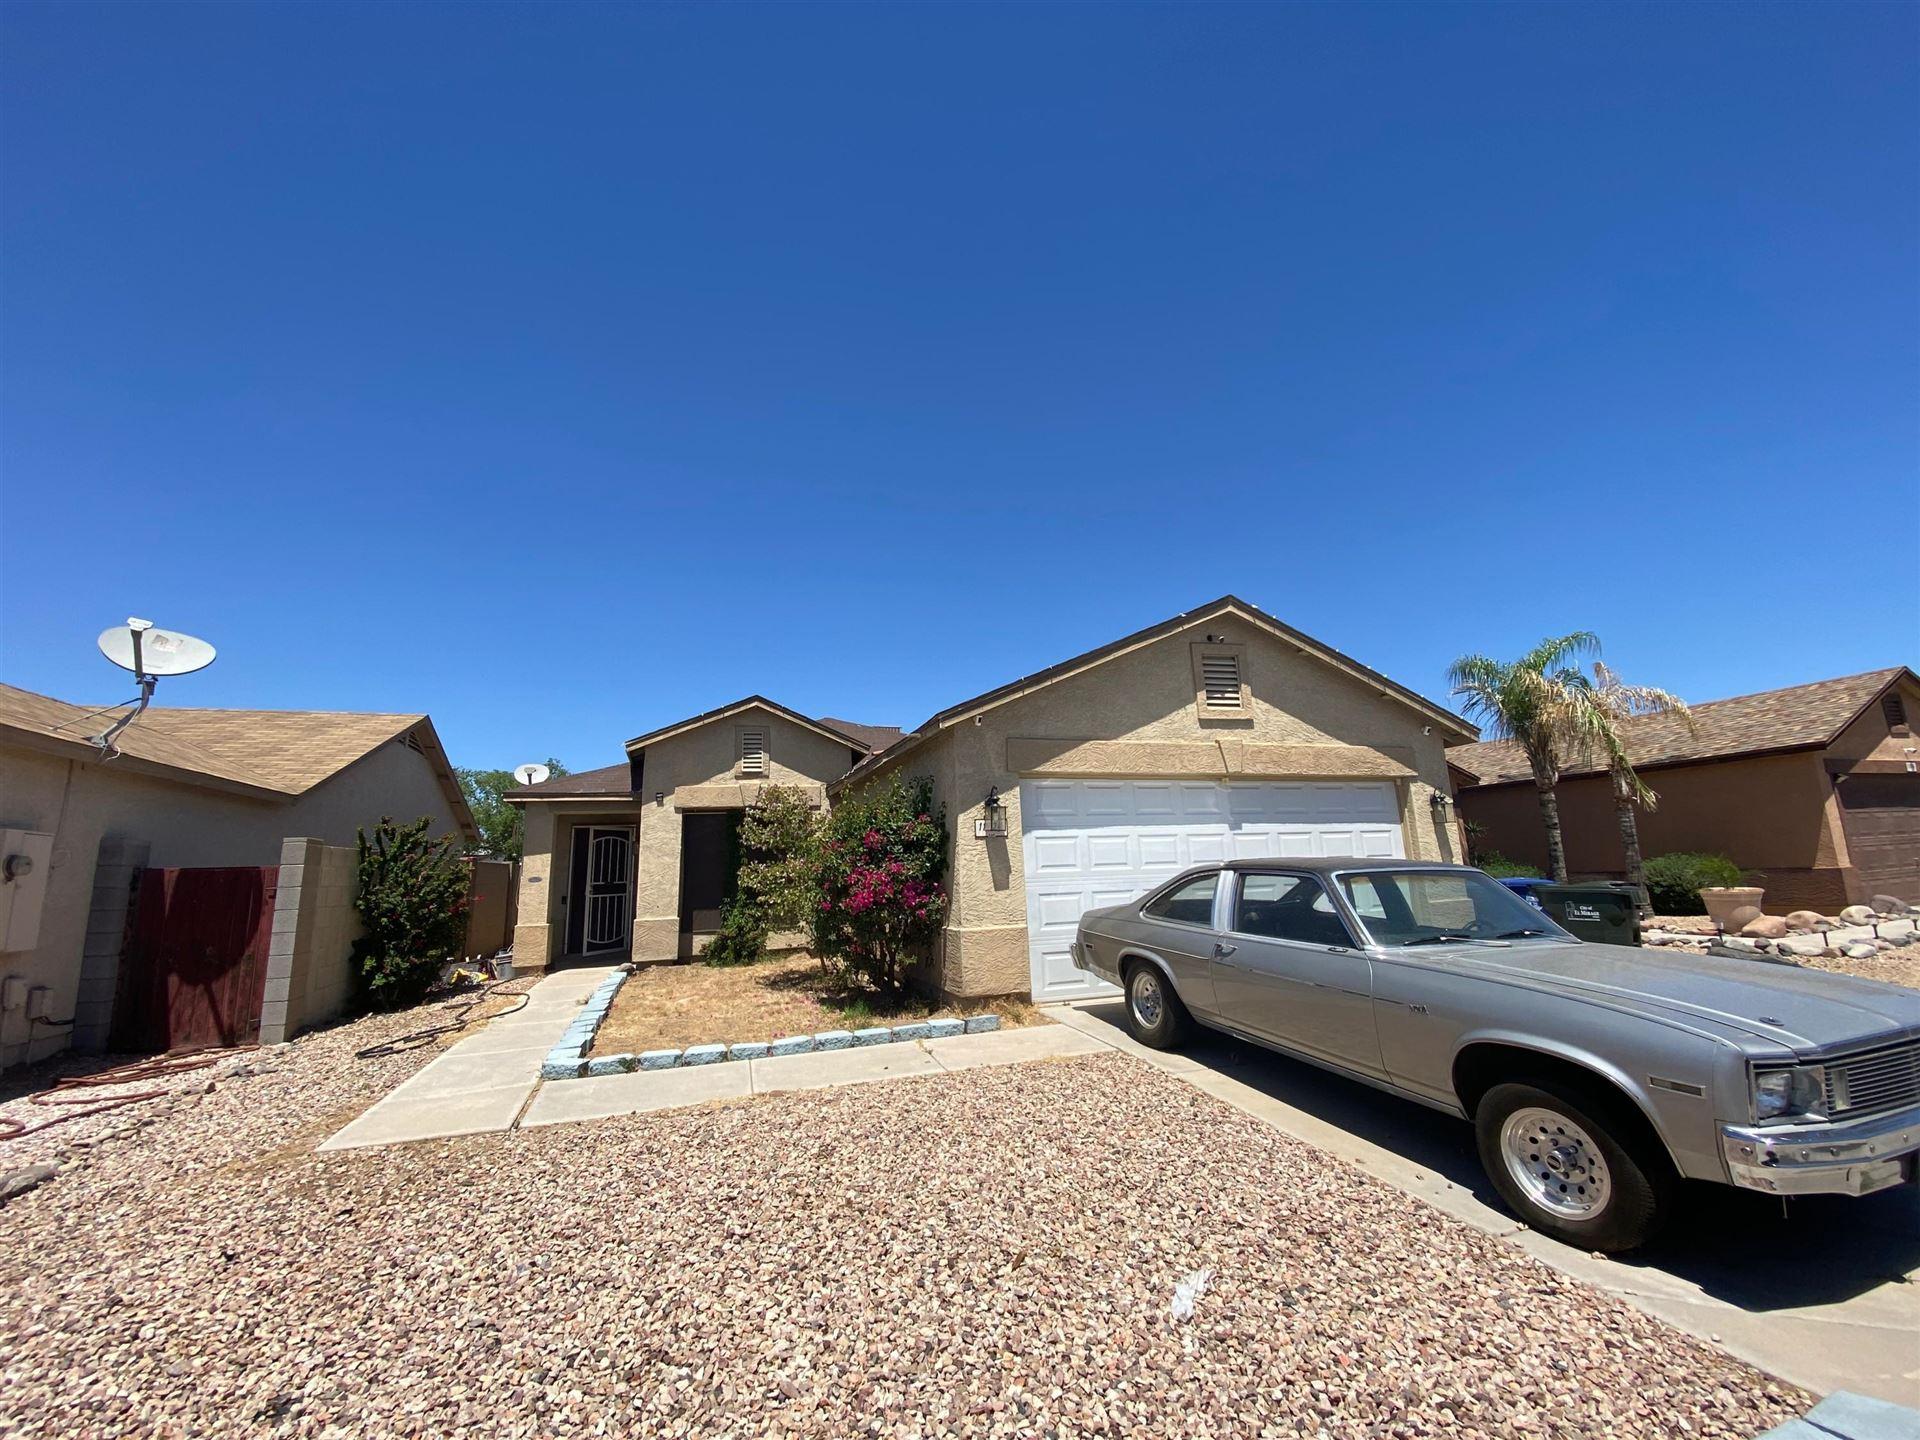 Photo of 11820 W SCOTTS Drive, El Mirage, AZ 85335 (MLS # 6229432)